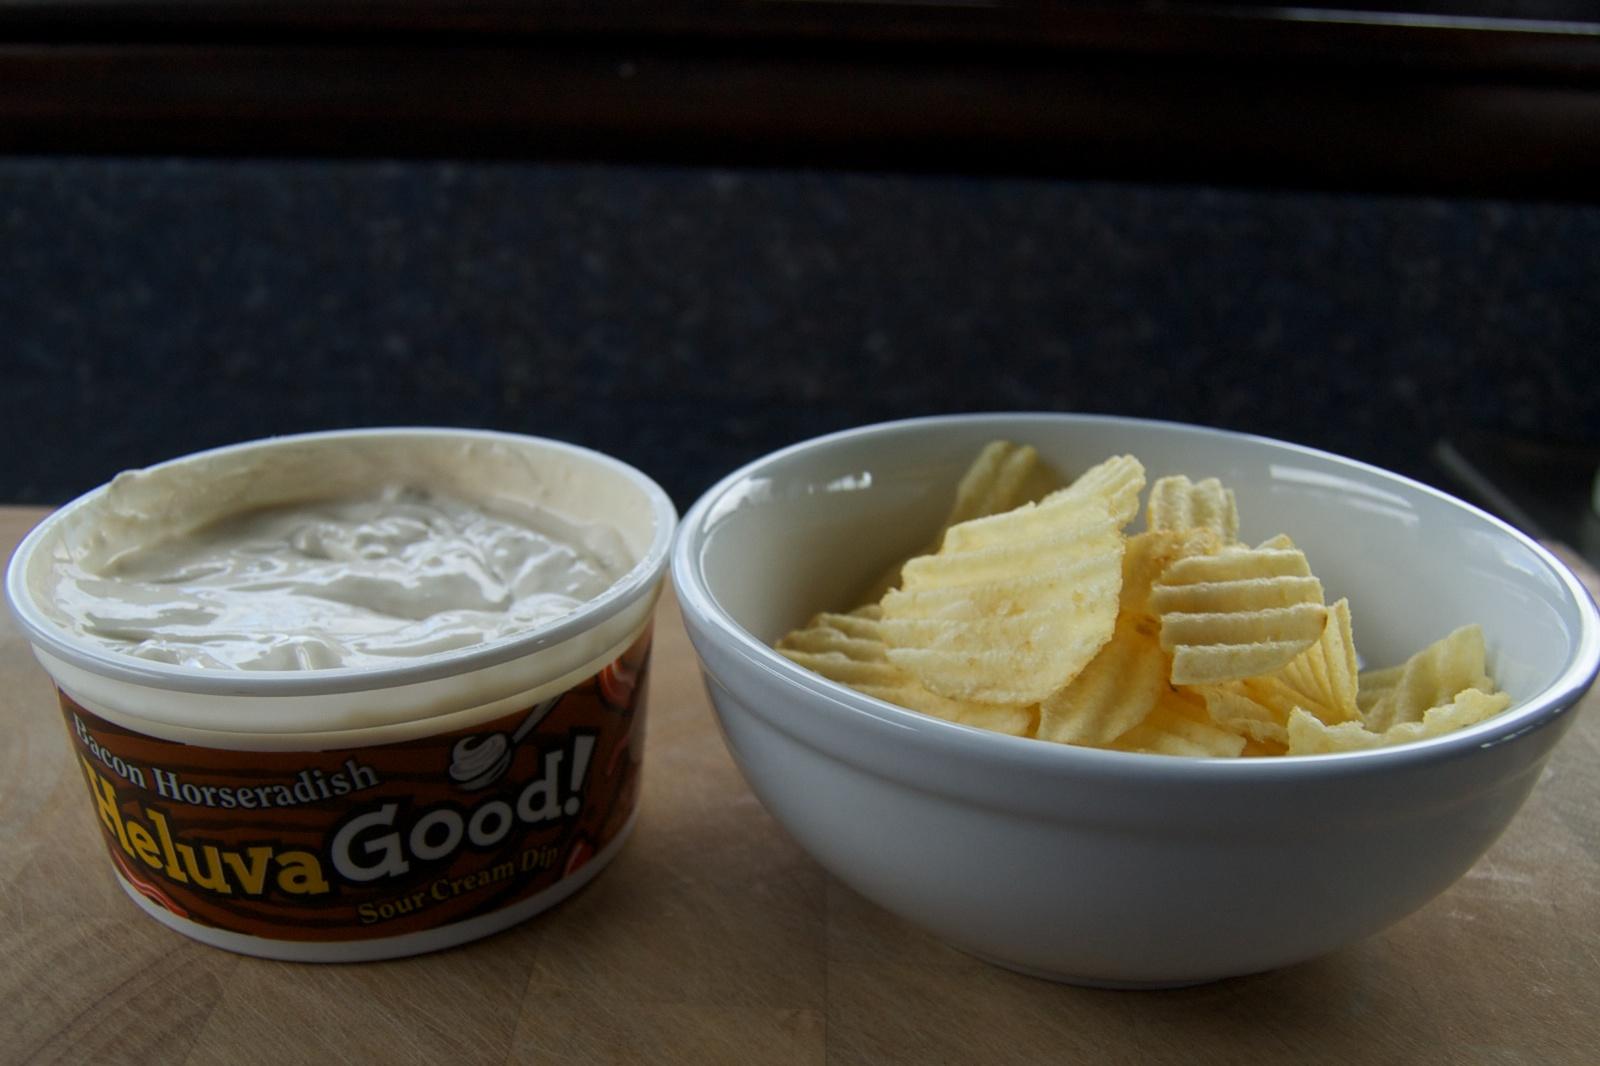 http://blog.rickk.com/food/2012/11/05/ate.2012.11.05.s.jpg